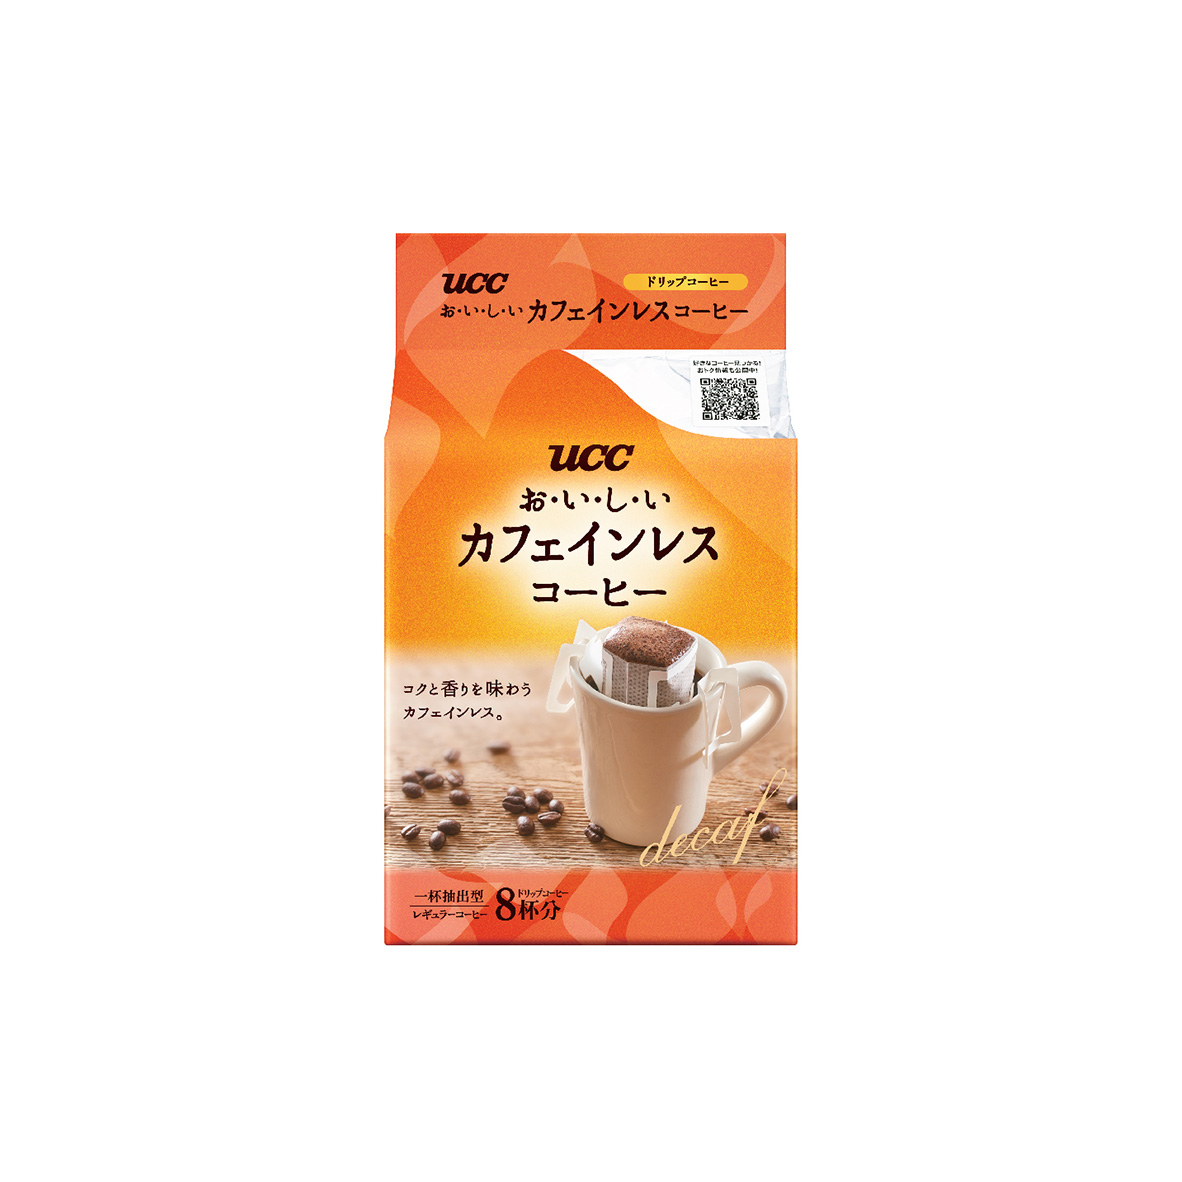 UCC Tasty Caffeine-Free Drip Coffee